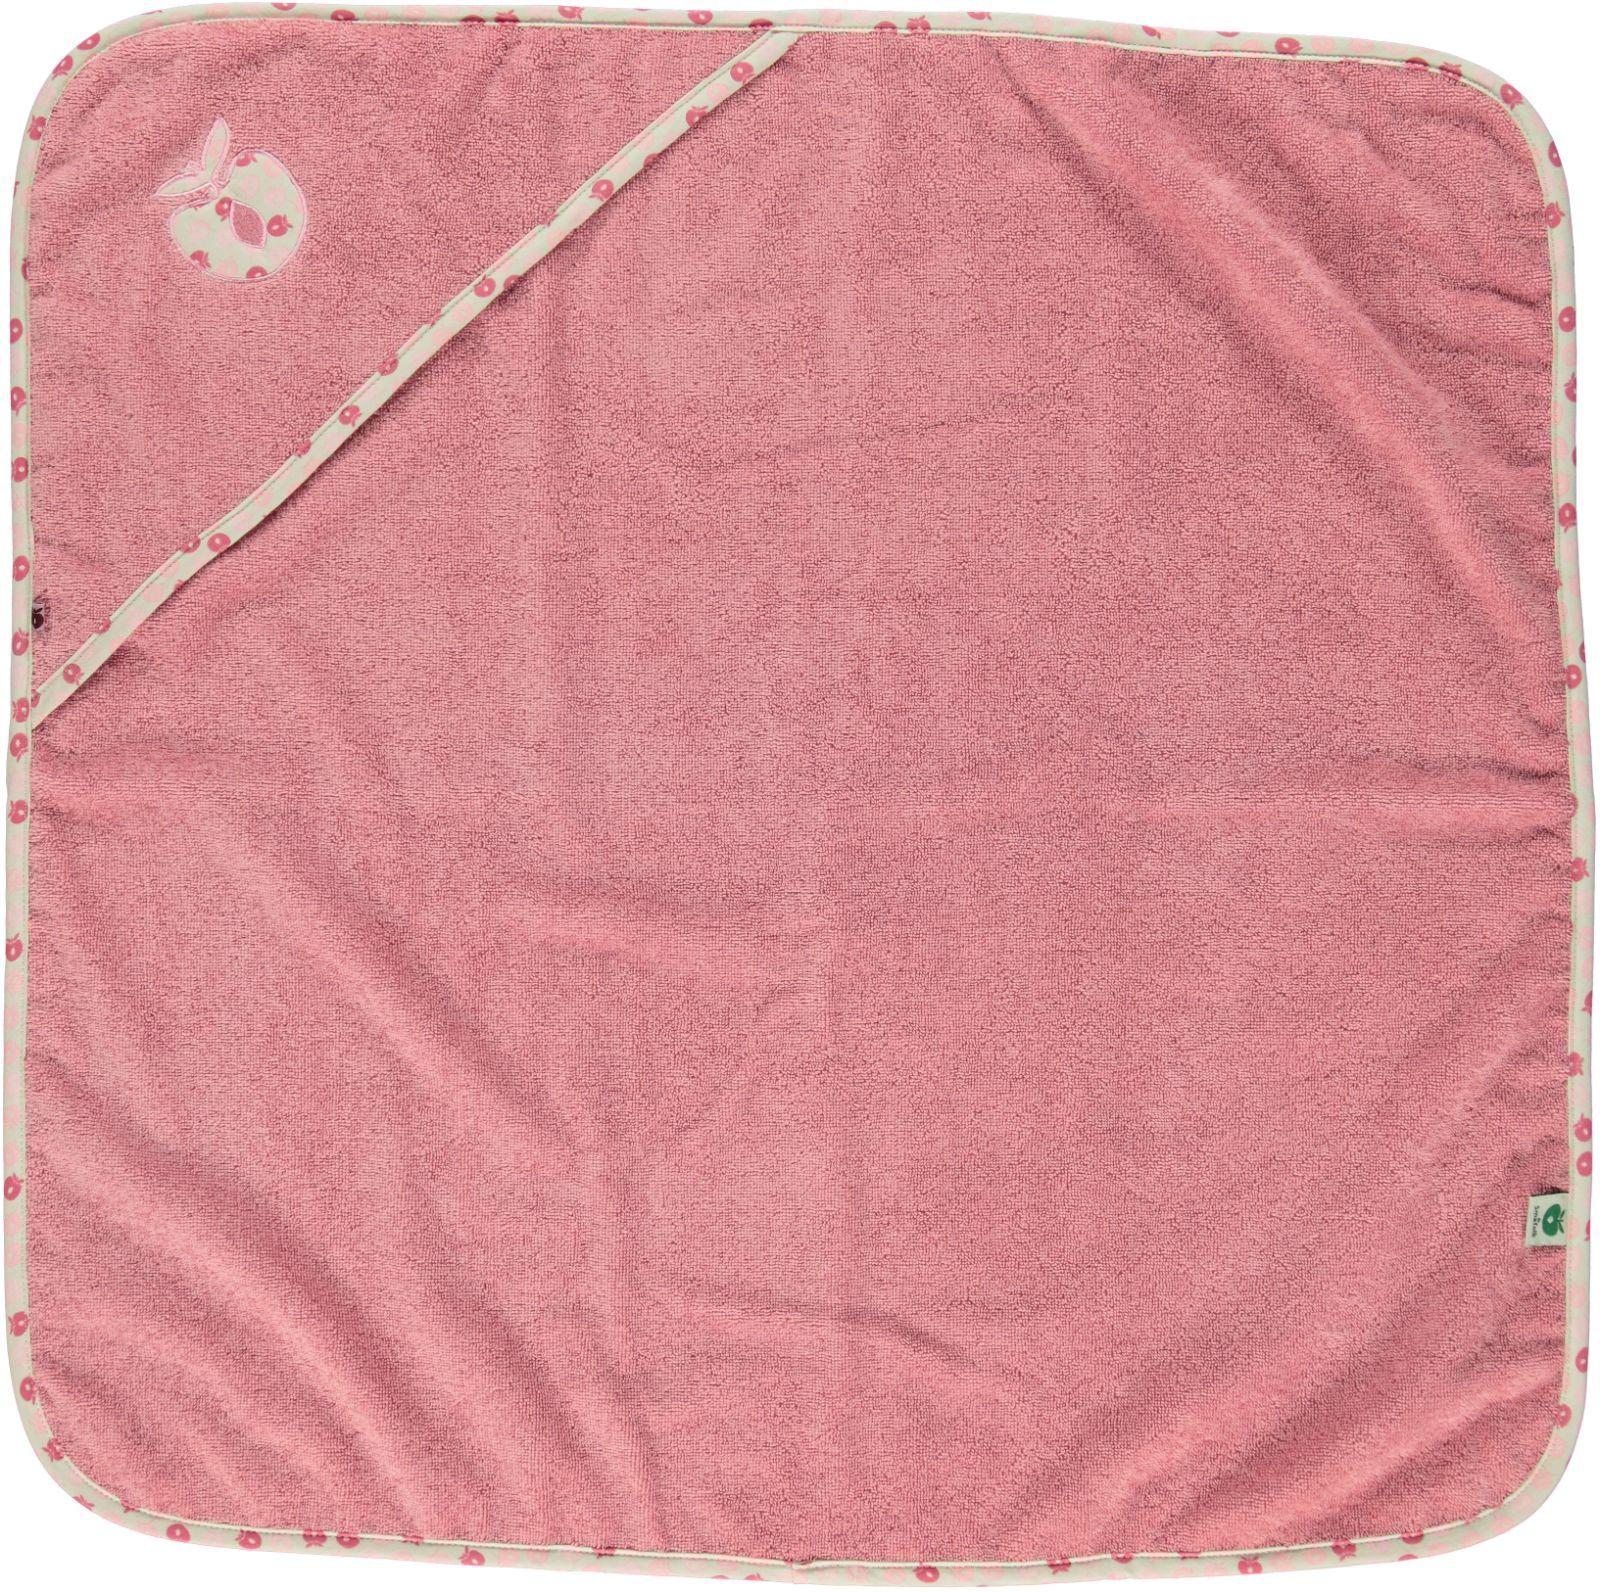 Småfolk – Småfolk baby håndklæde - gammelrosa fra babygear.dk